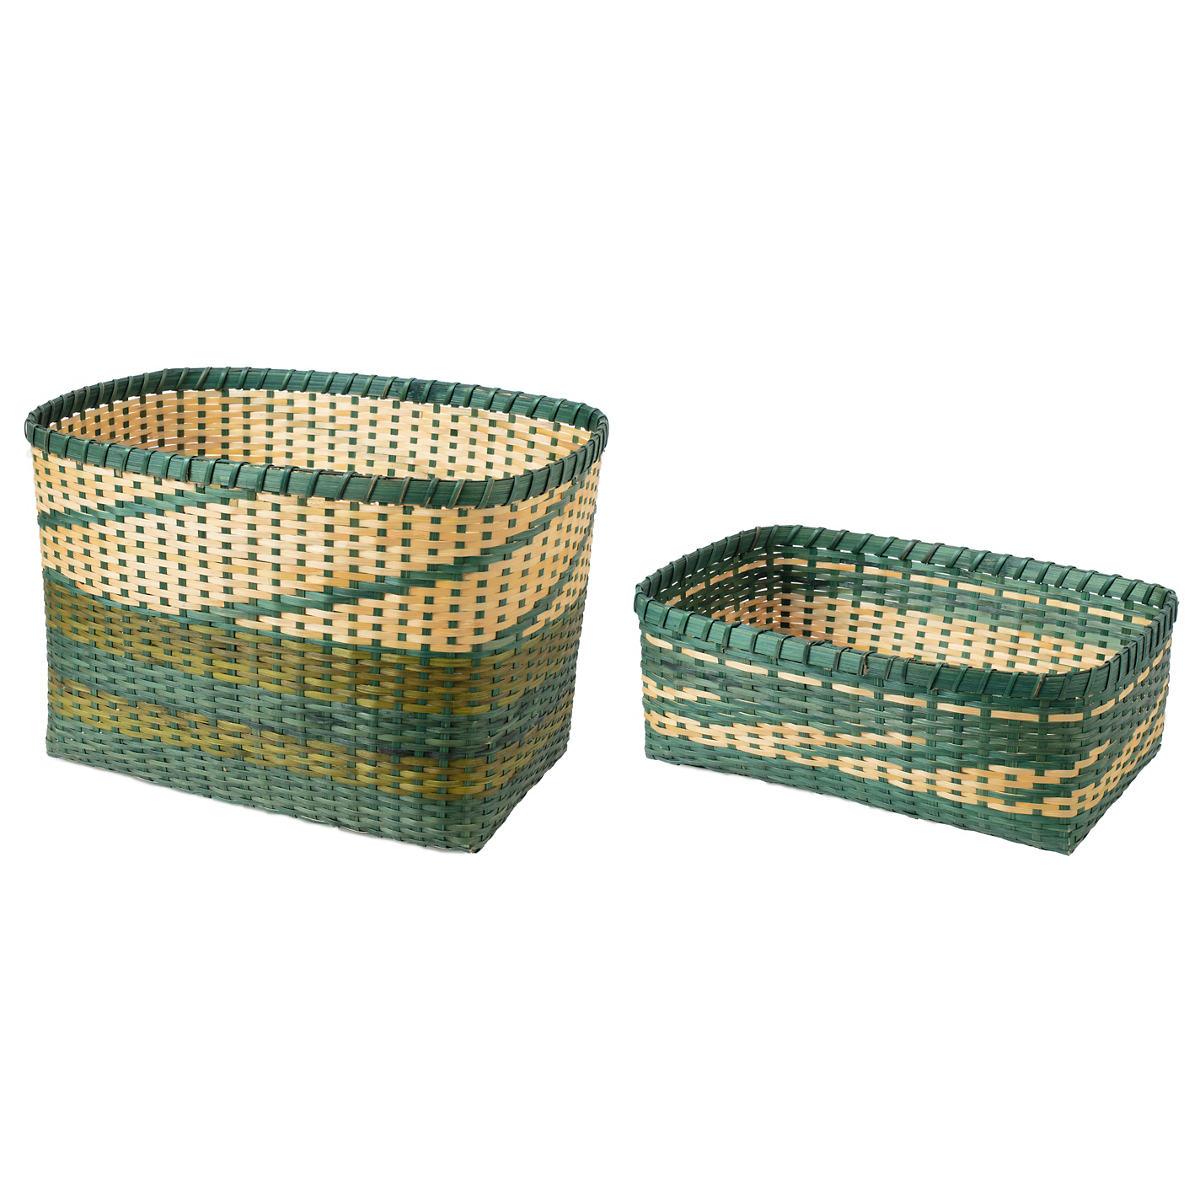 Cannes Evergreen Basket